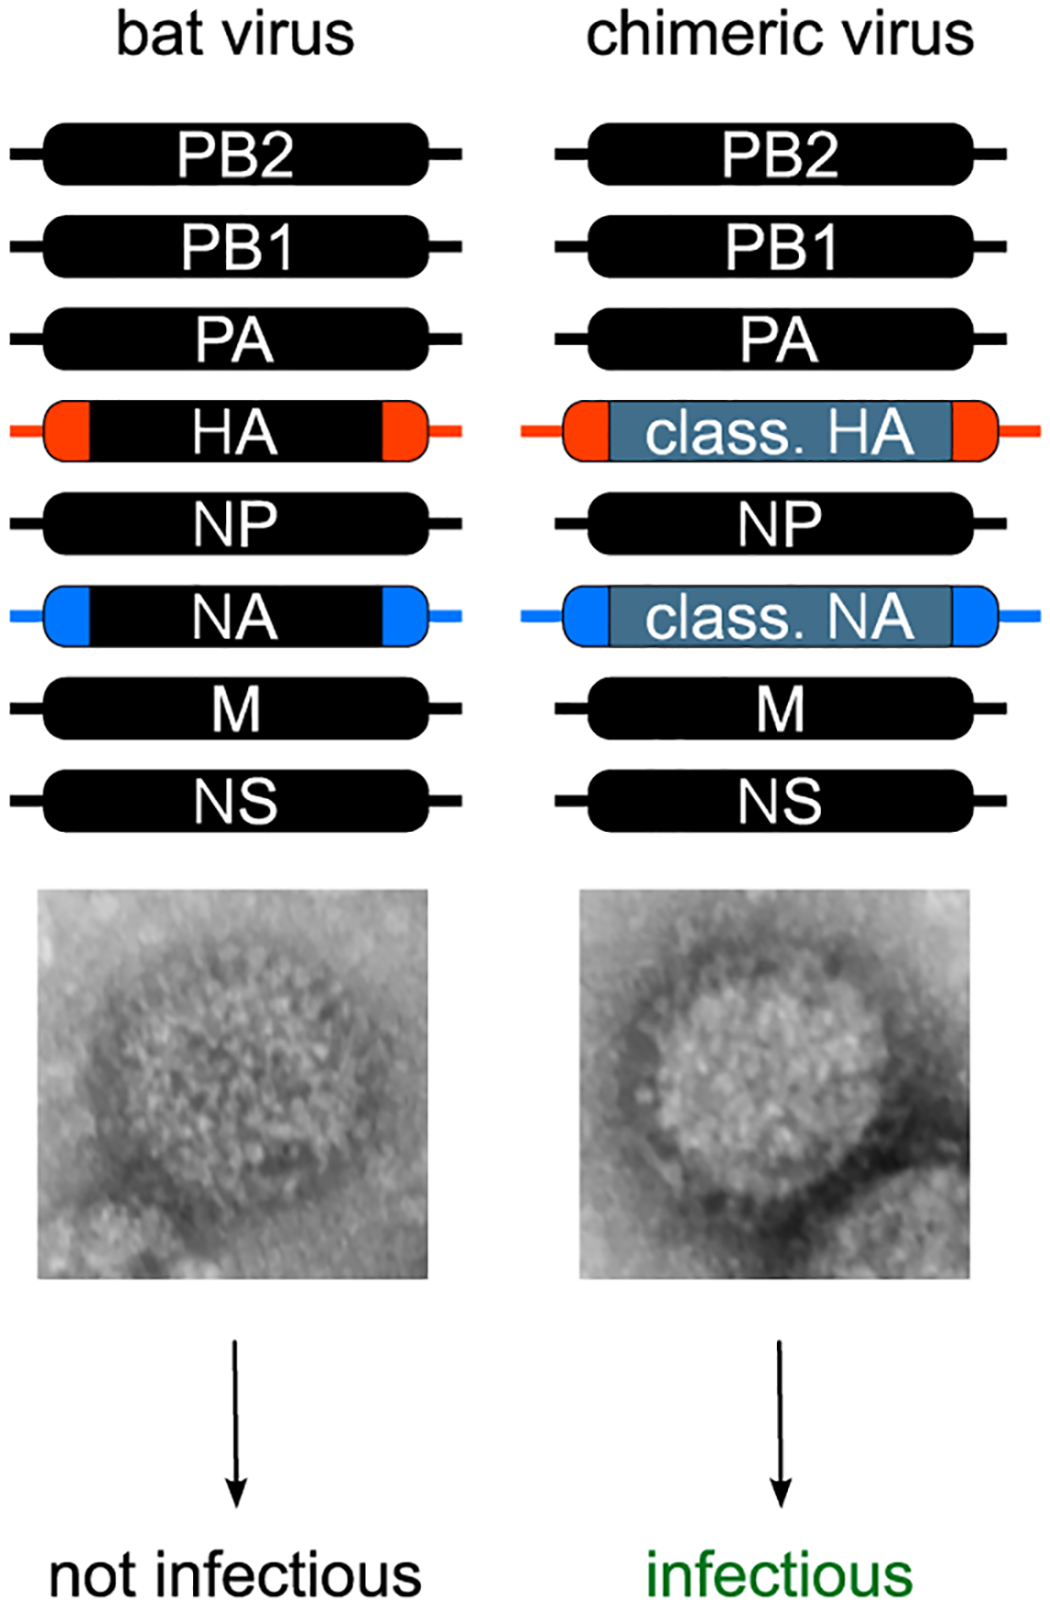 Generation of recombinant bat chimeric influenza viruses.